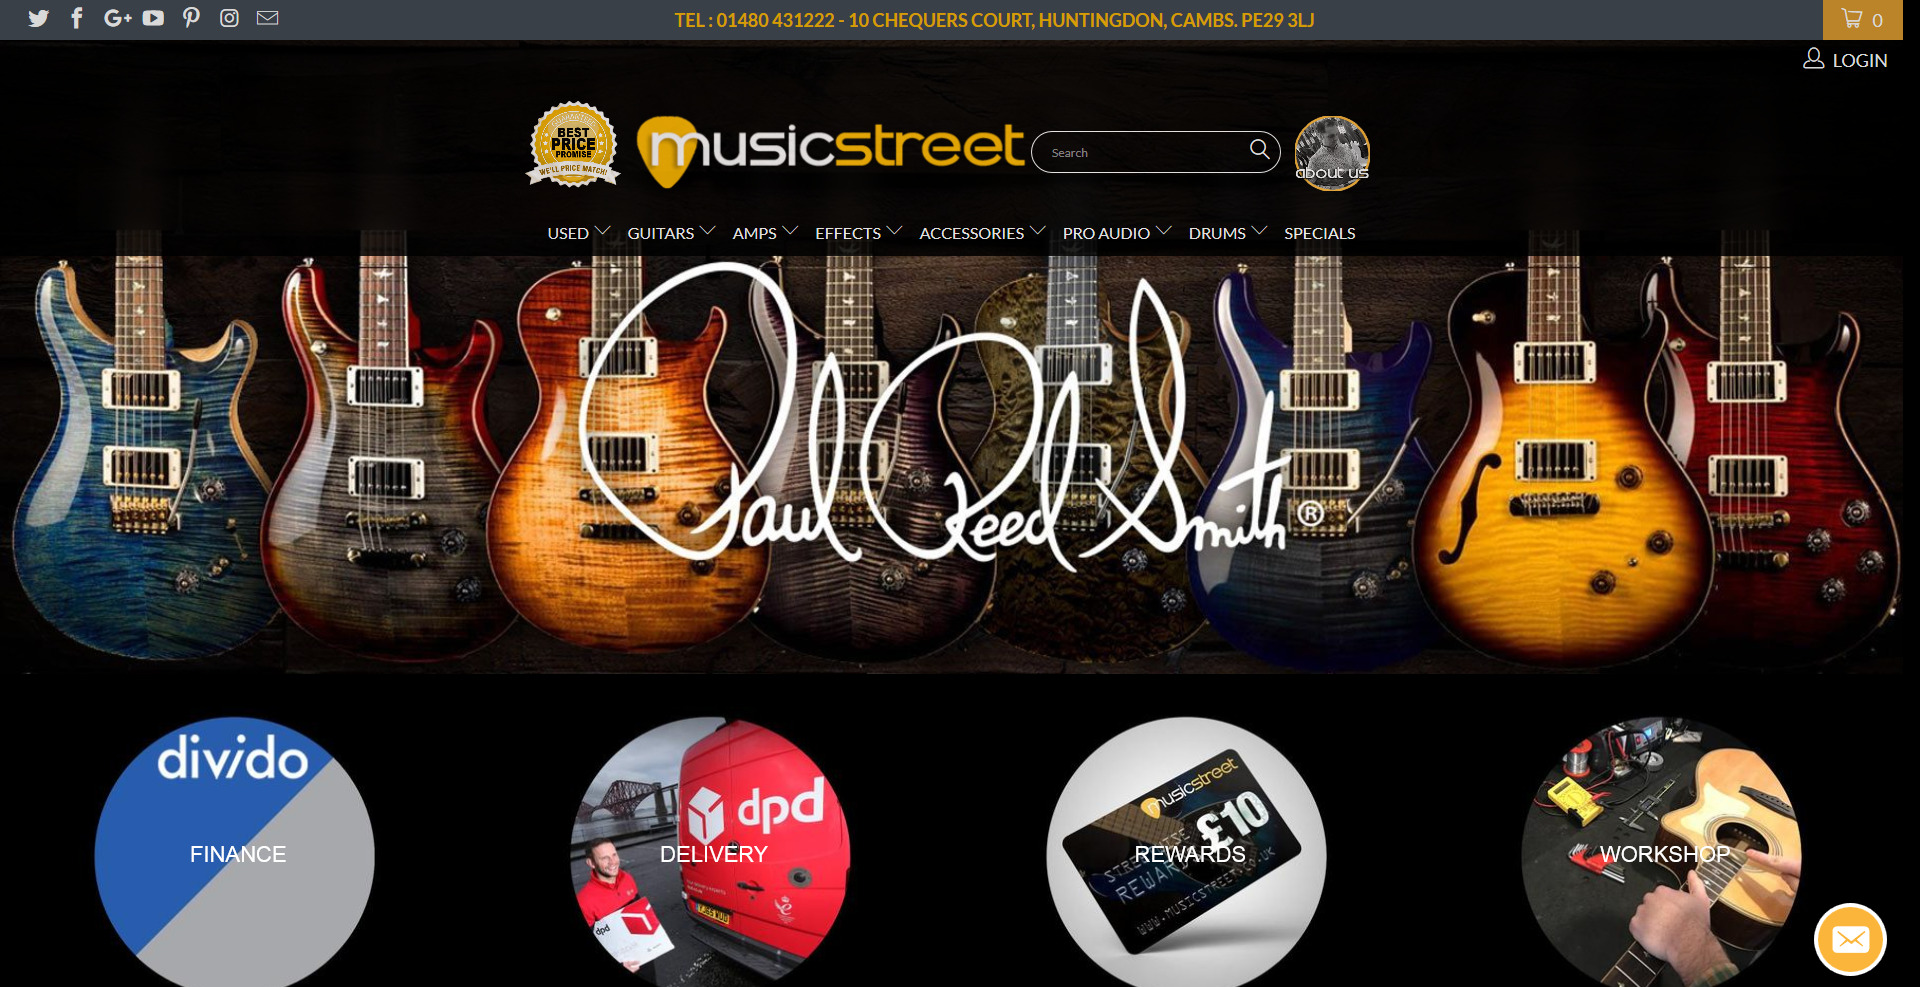 MusicSreet.co.uk